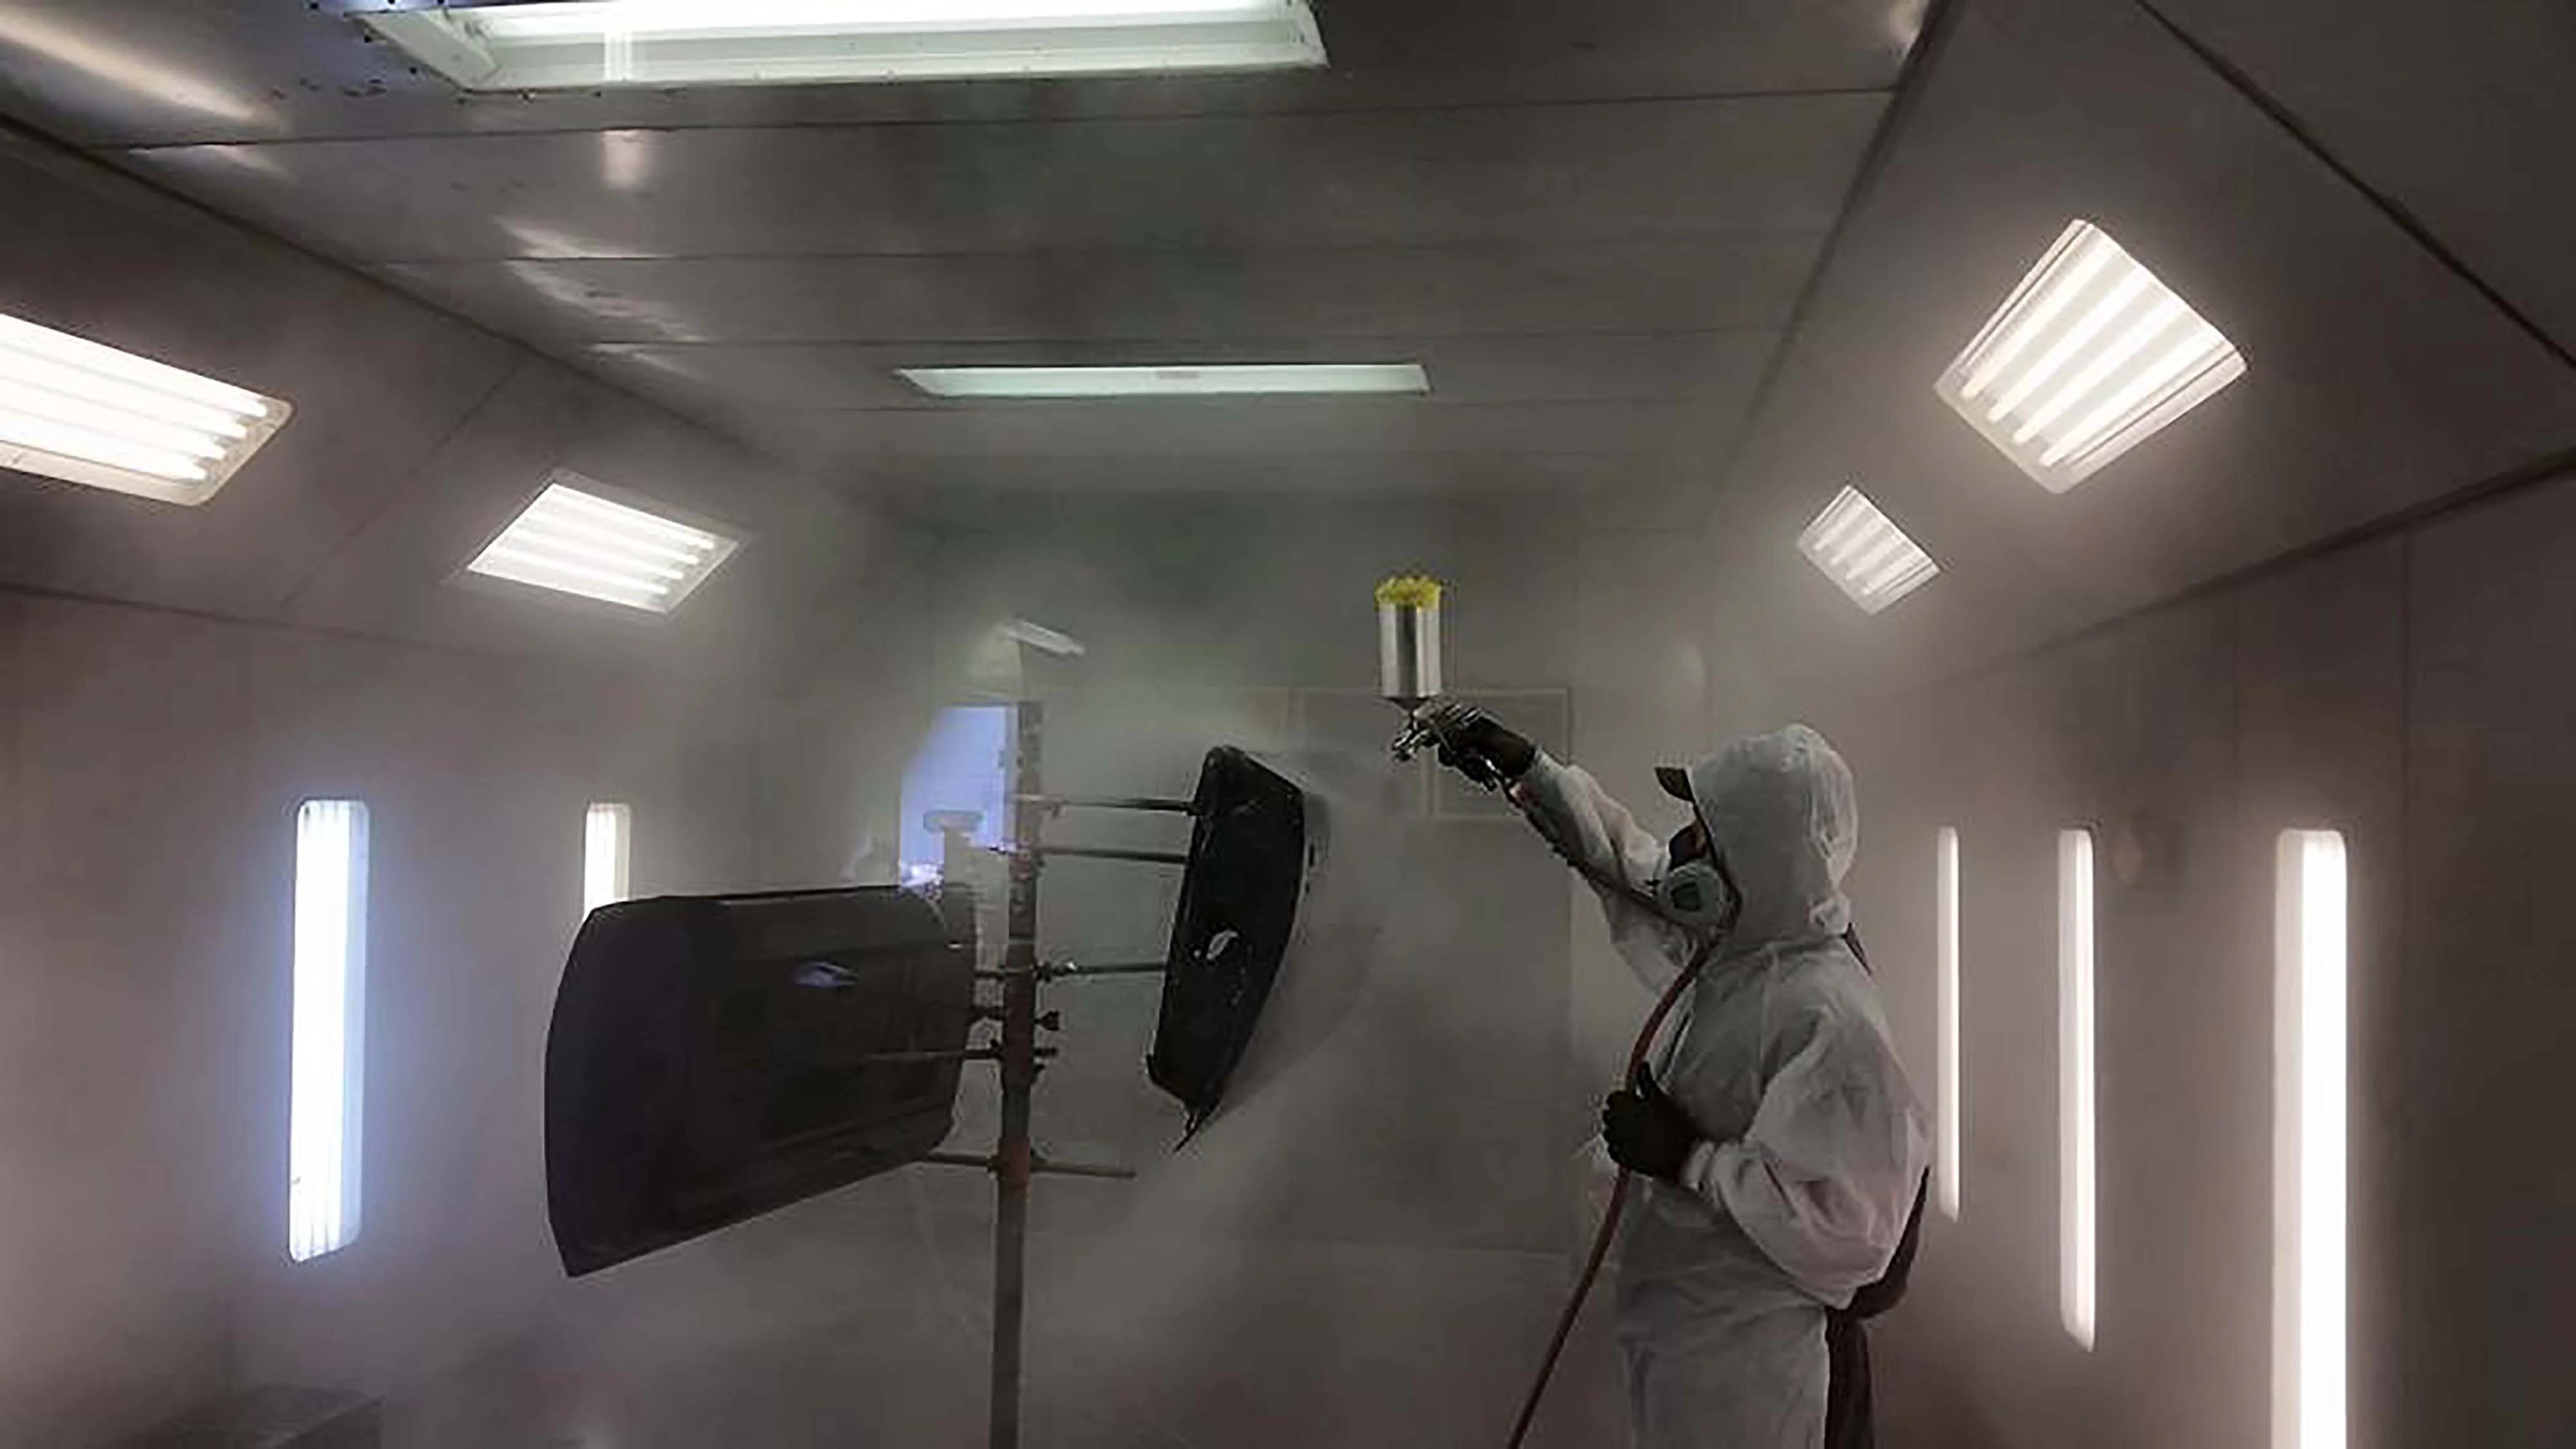 A cloud of spray fills the paint booth as Webb applies the last coat of the Axalta Chromapremier.